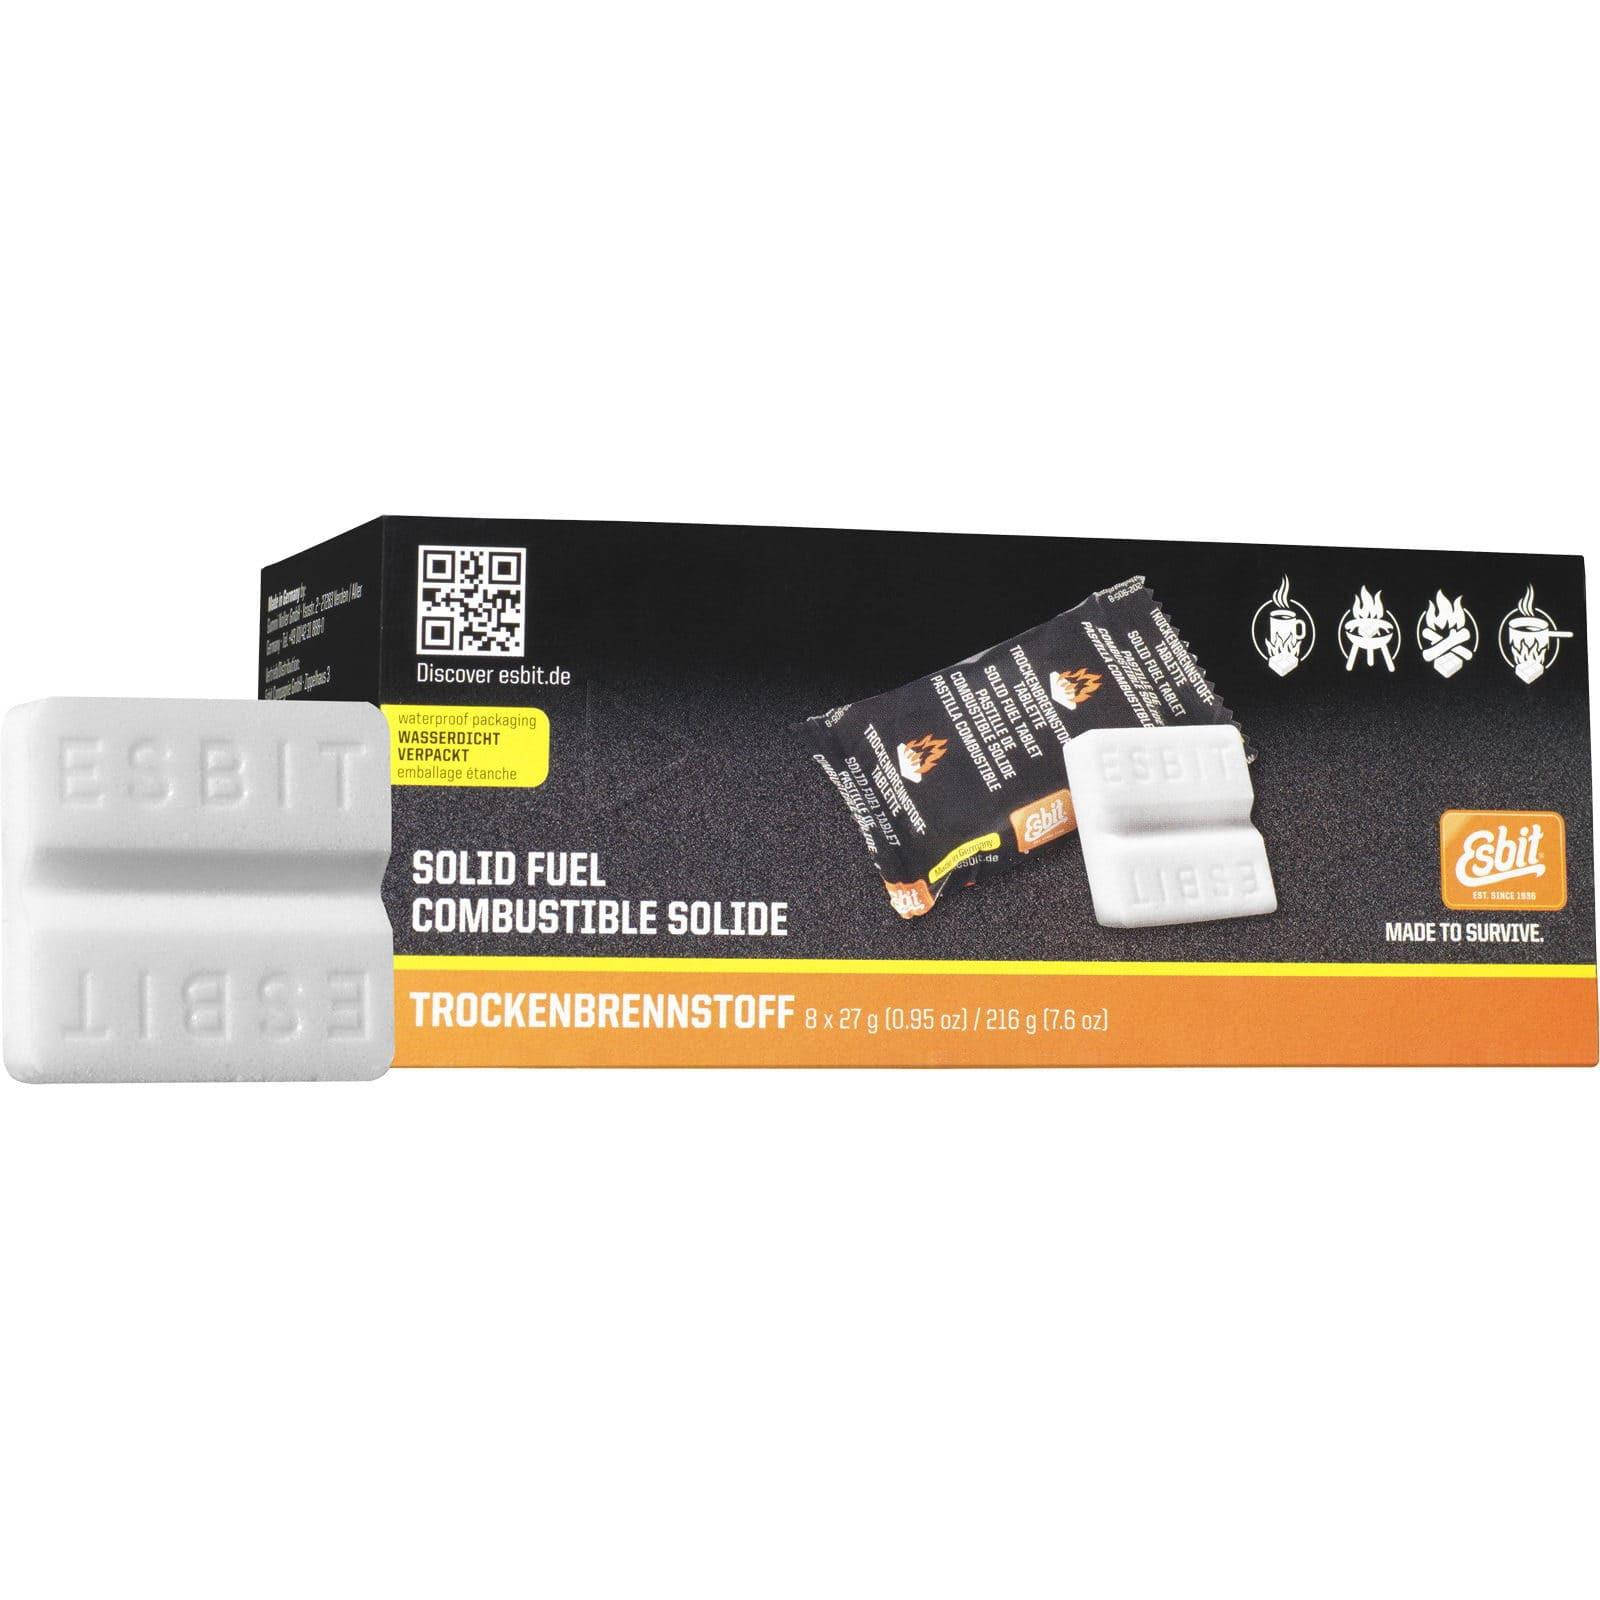 Tablettes Esbit 8 x 27 g